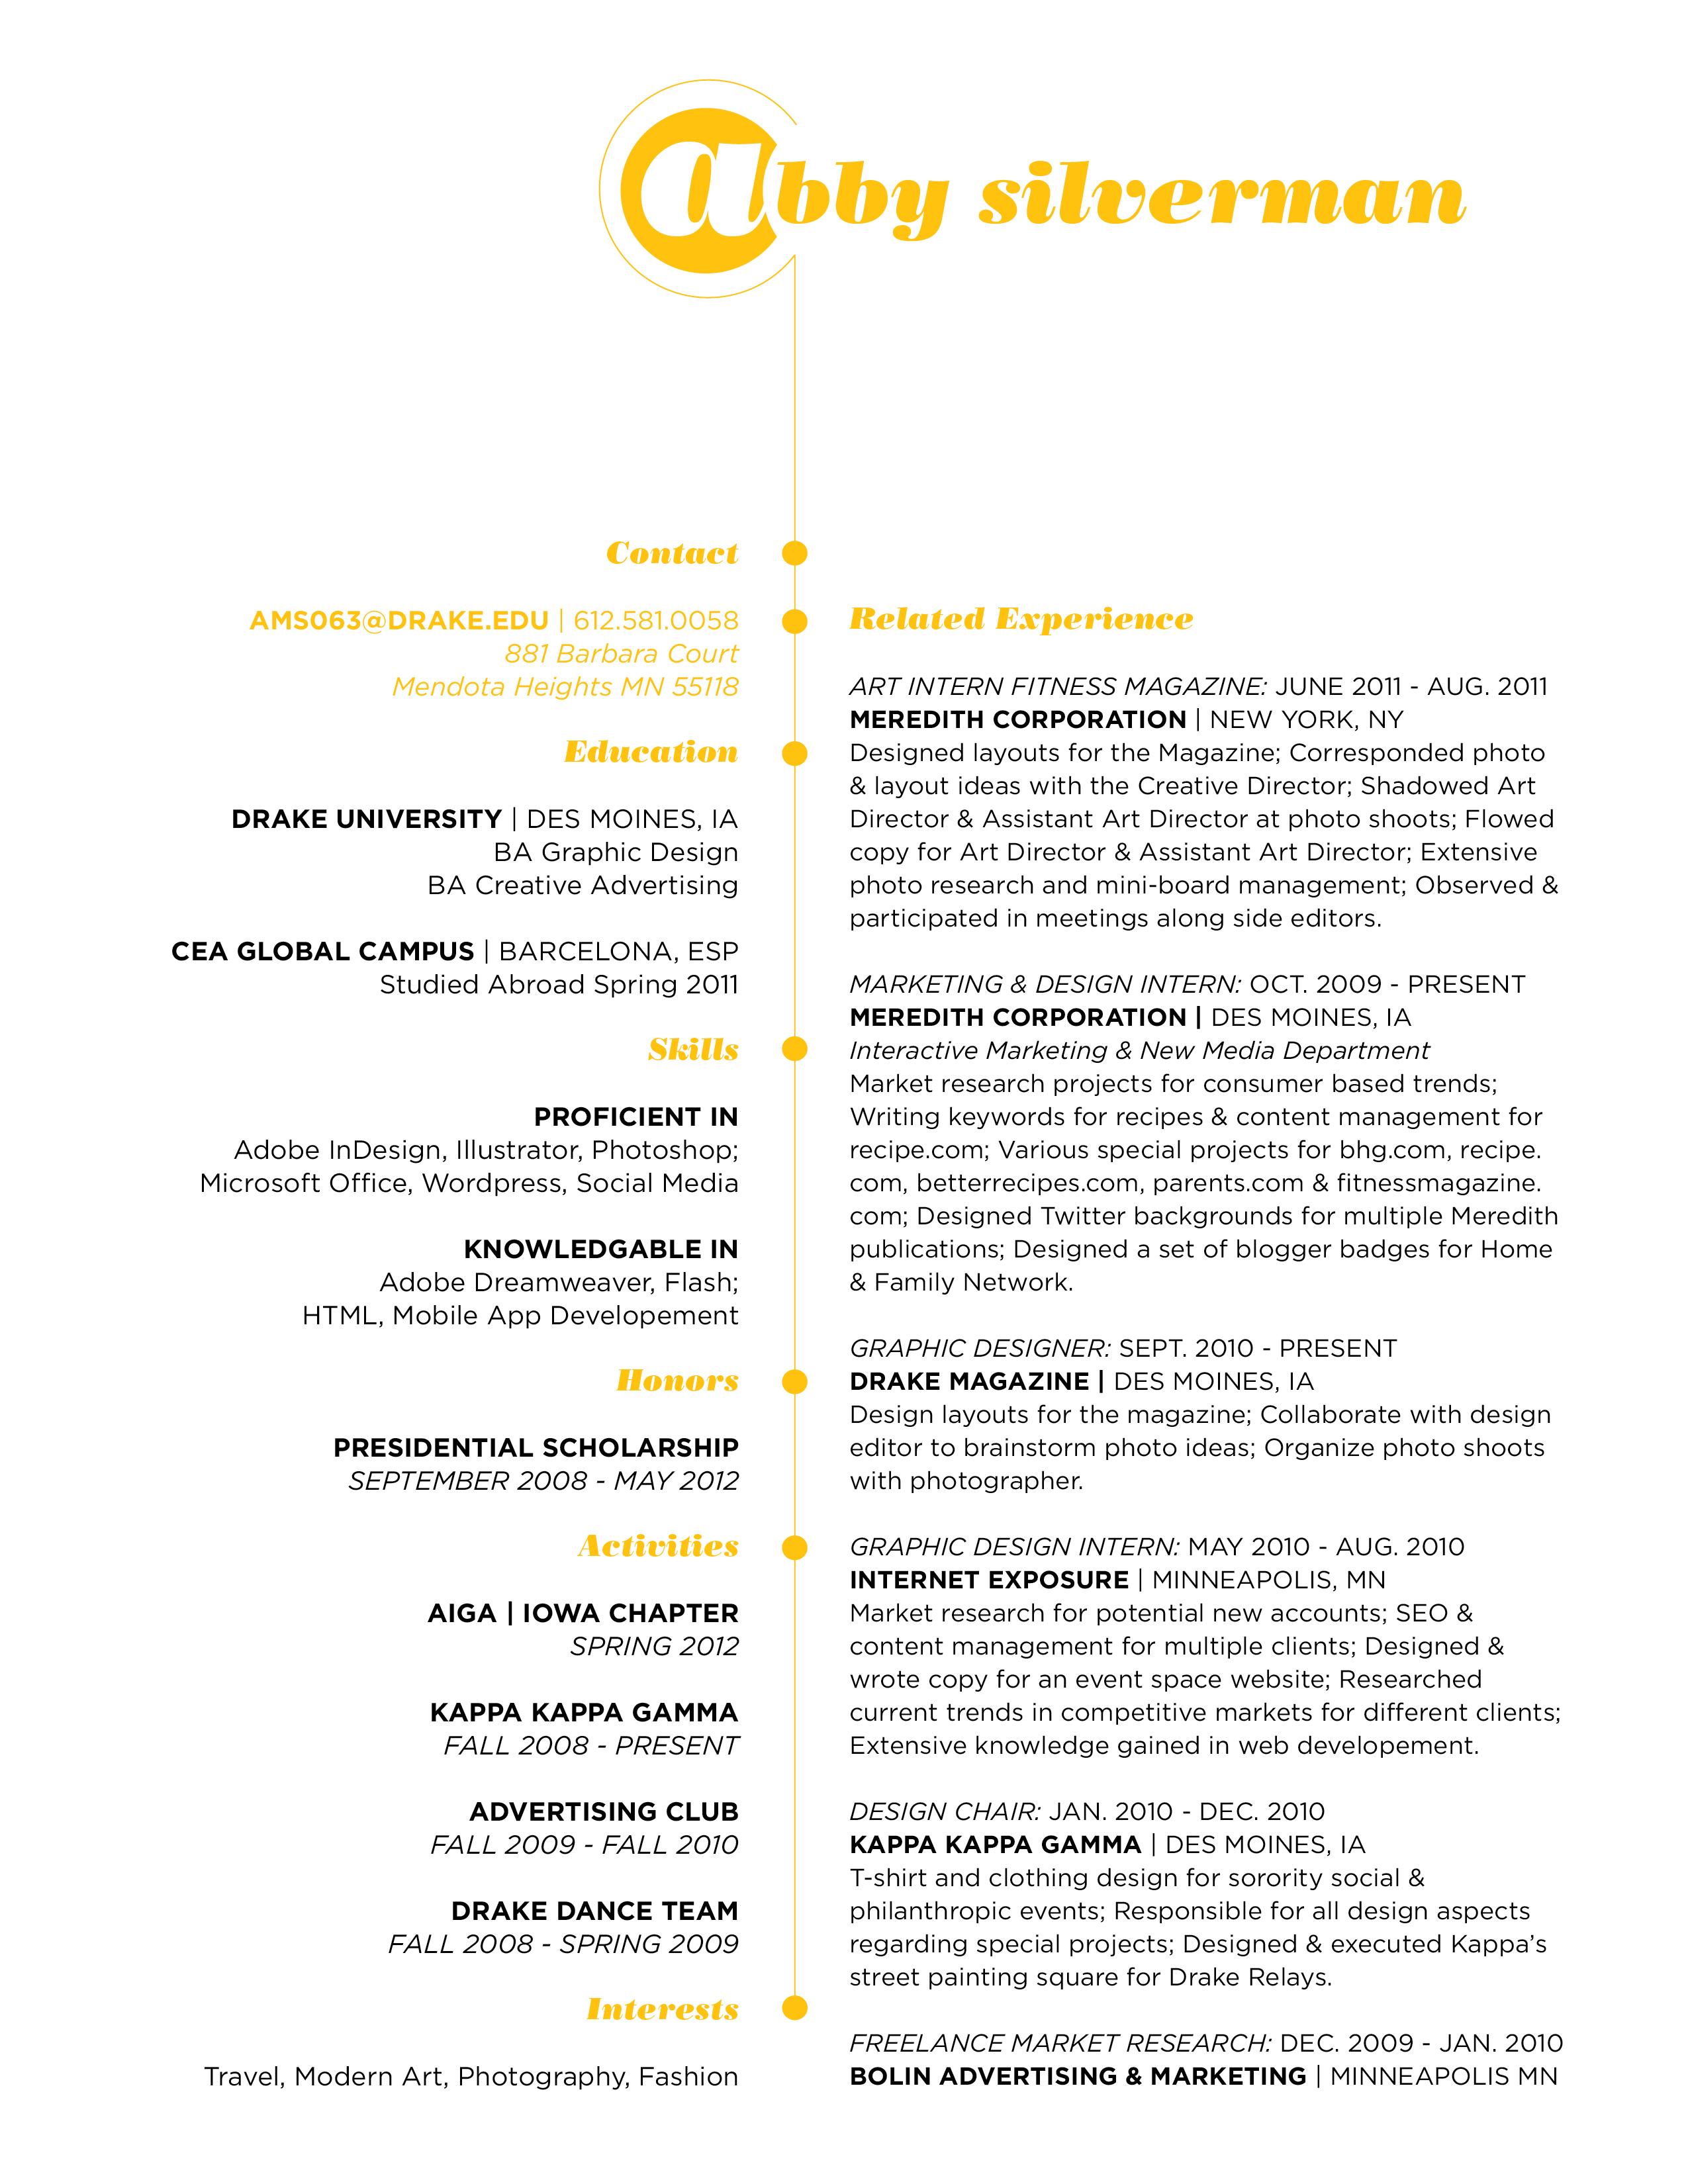 Resume and Cover Letter Design Update  Art 191 Graphic Design Capstone